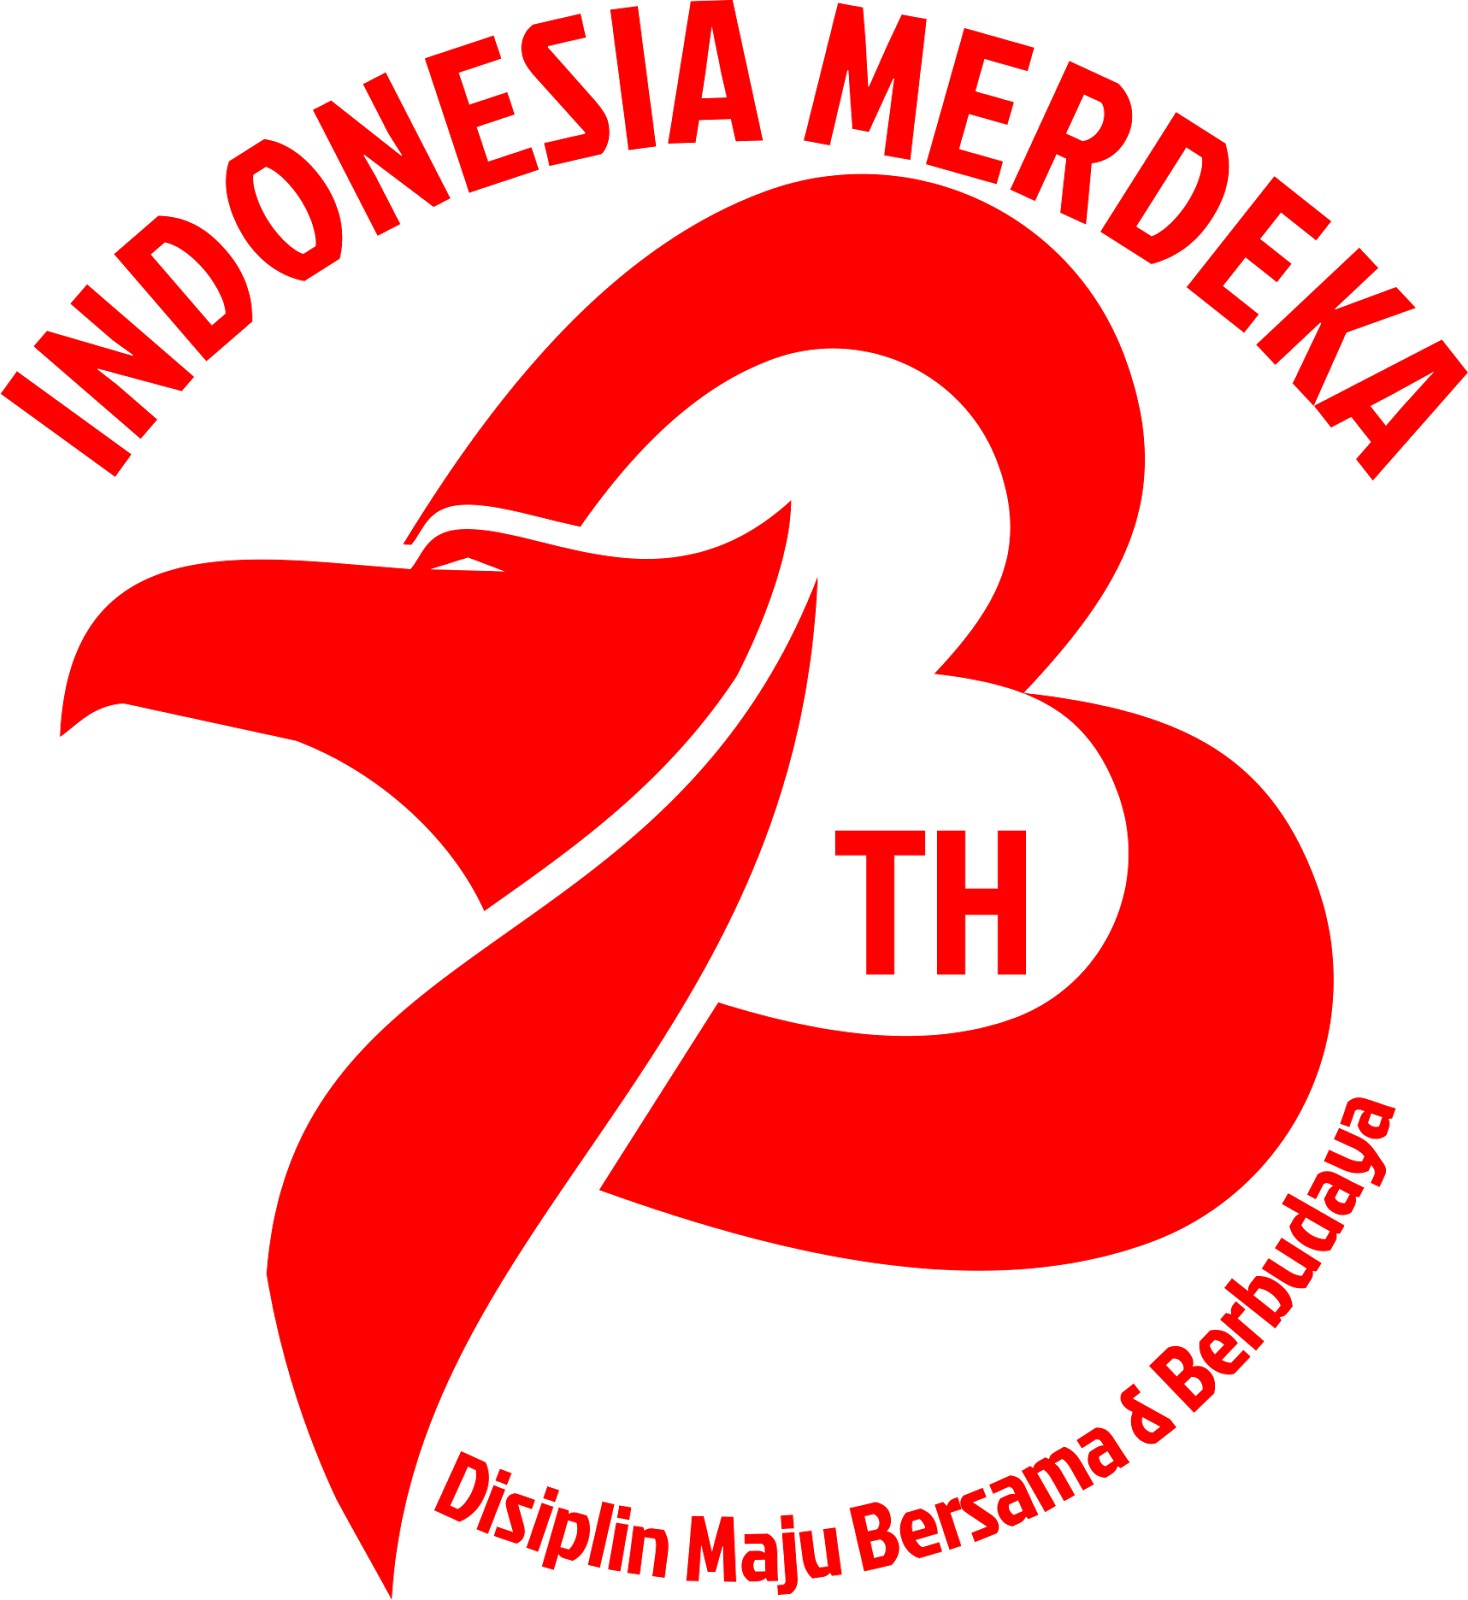 Logo 73 tahun Indonesia Merdeka ORCHIDSIGN